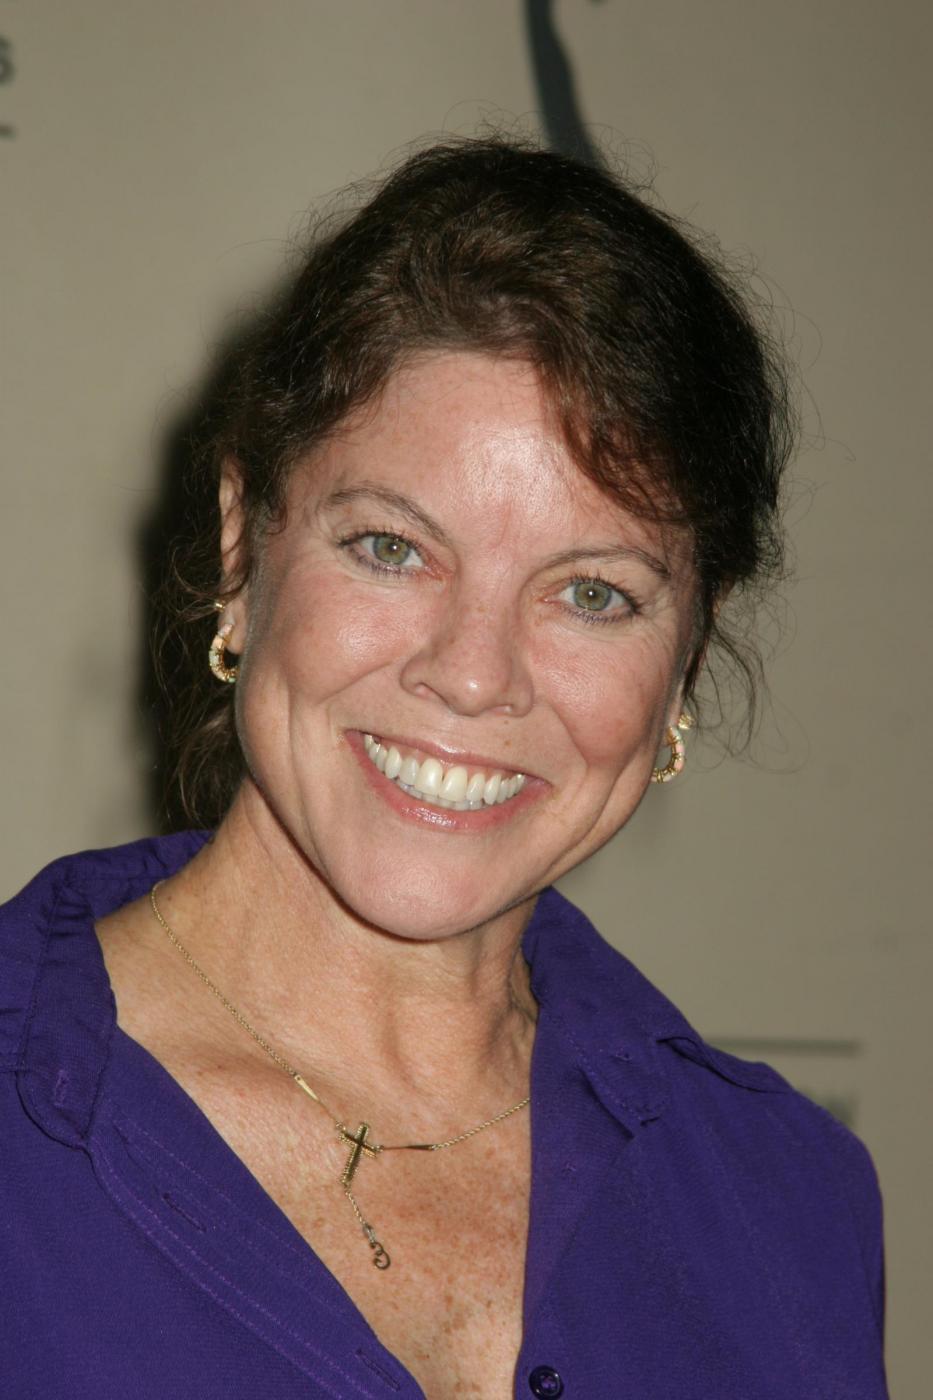 Morta l'attrice Erin Moran, star di Happy Days